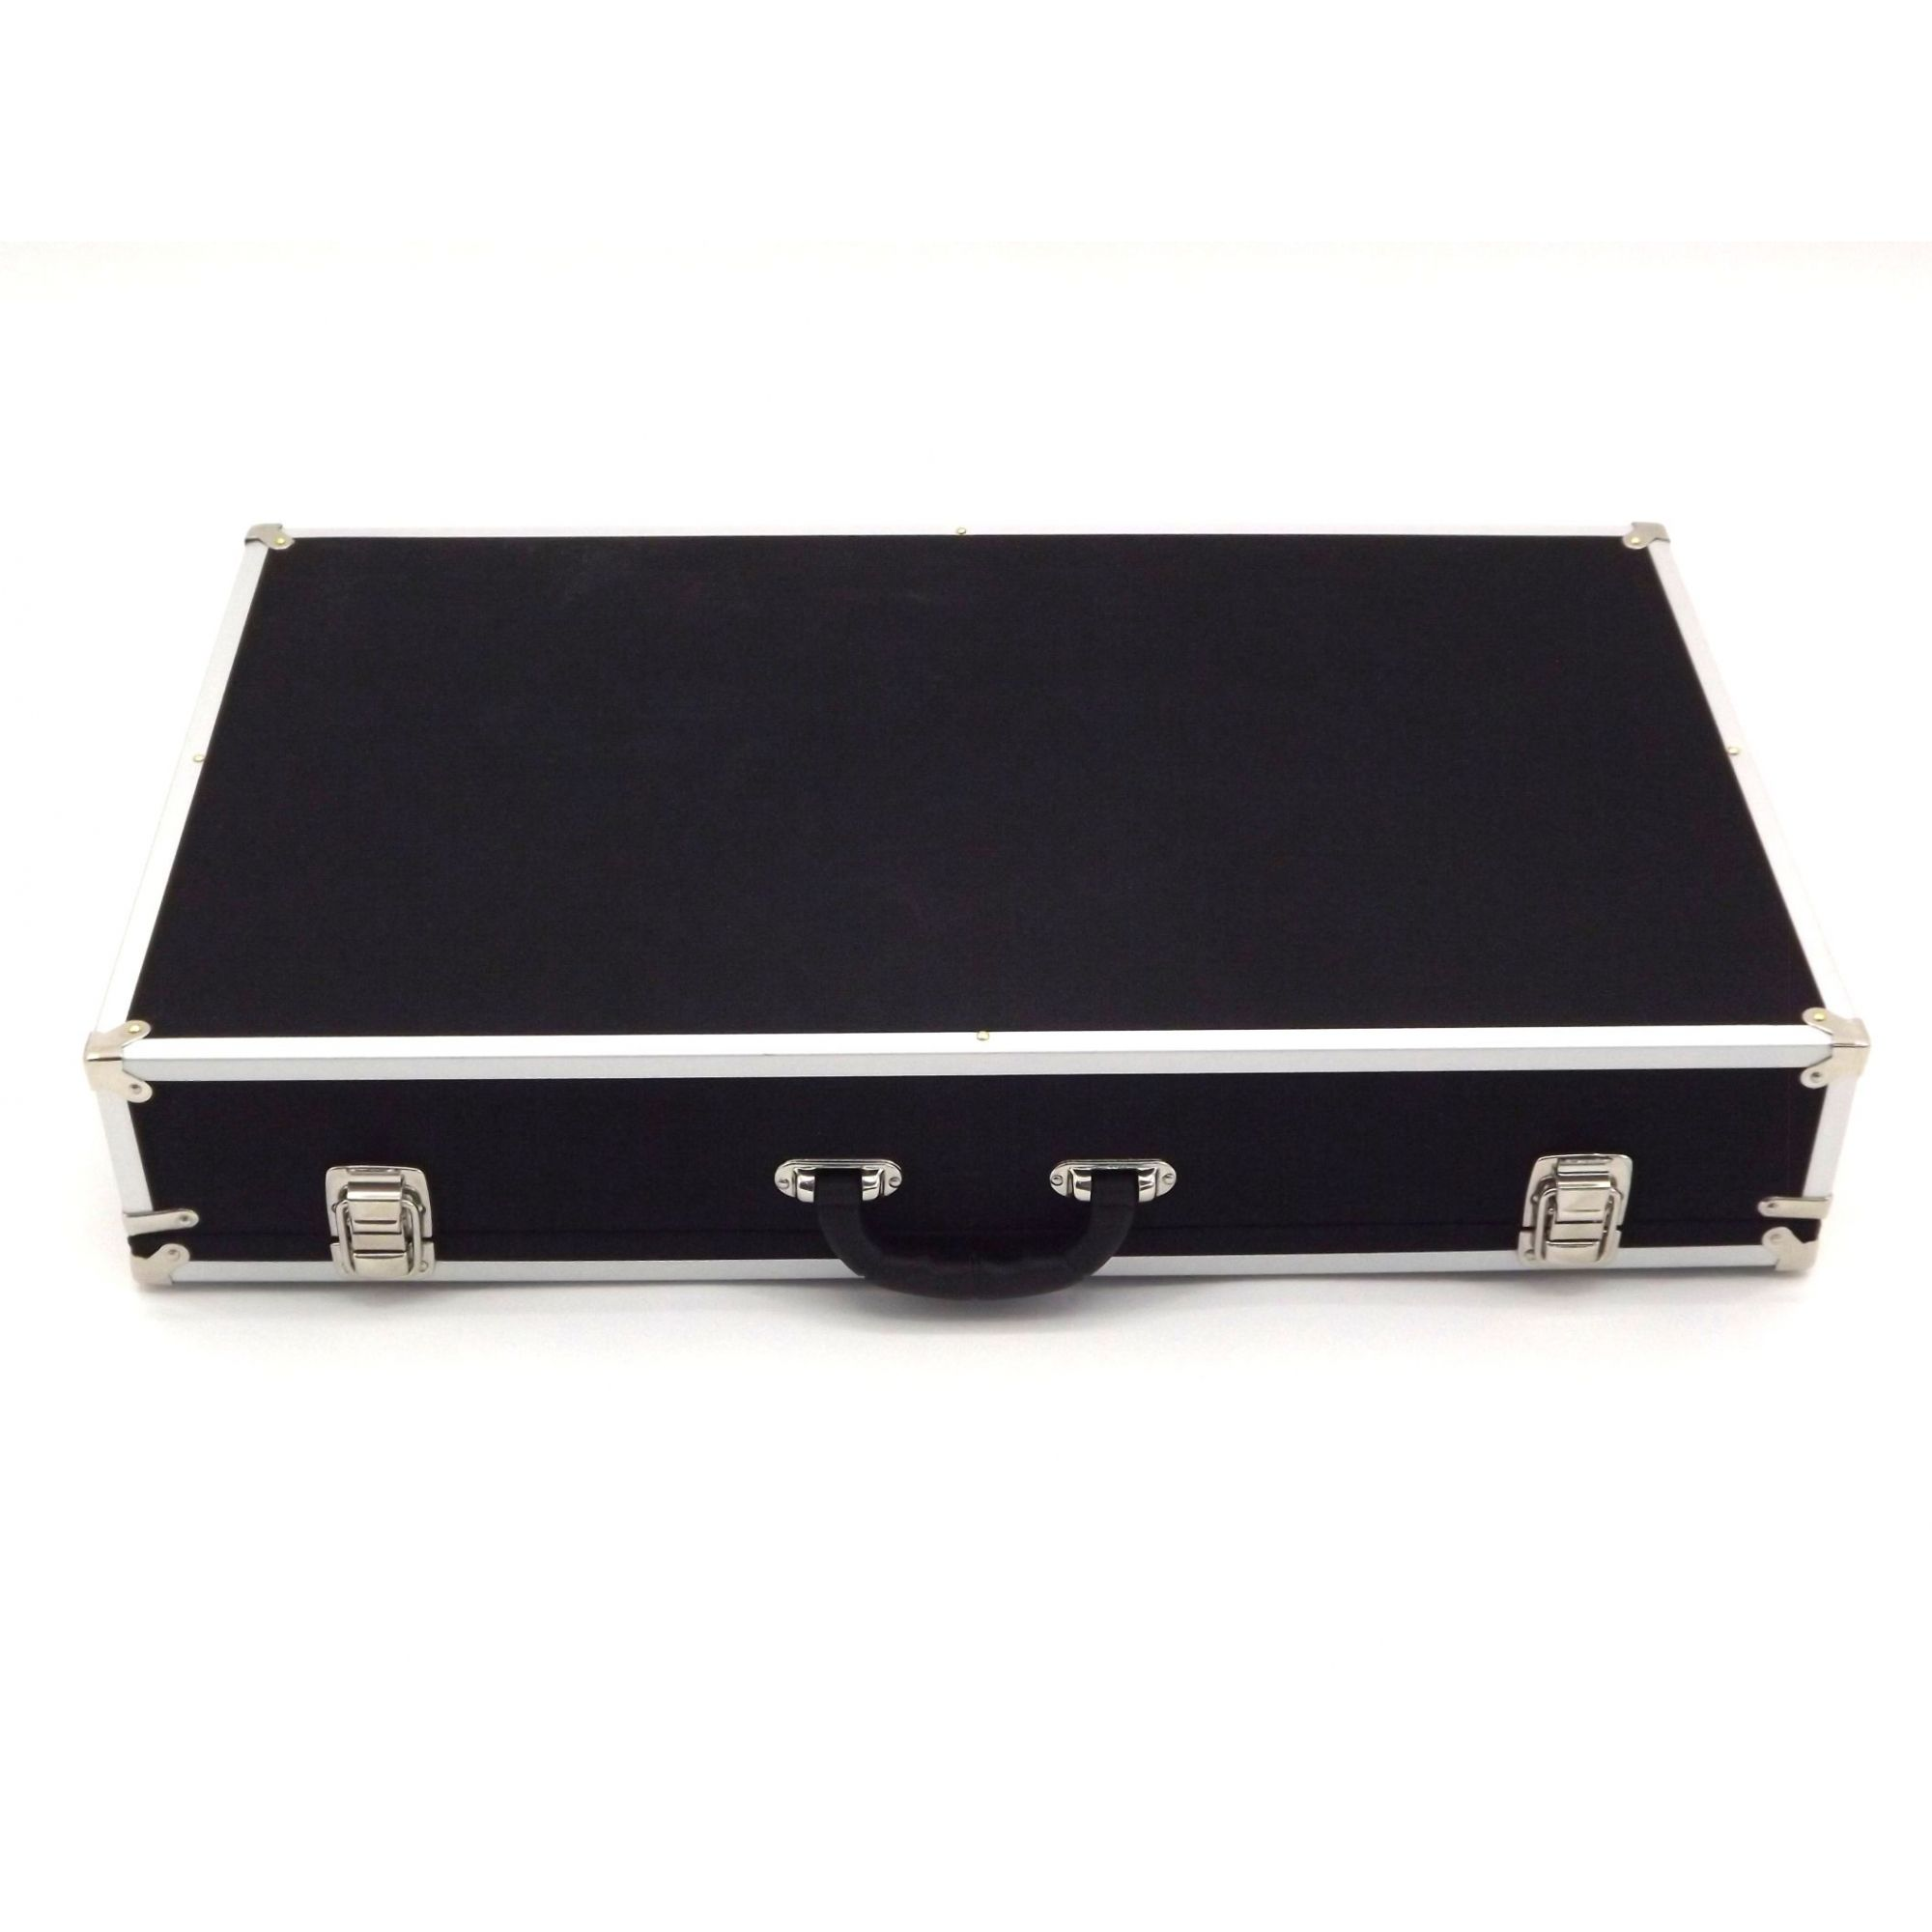 Case para Pedais 40x30x10cm Super Luxo